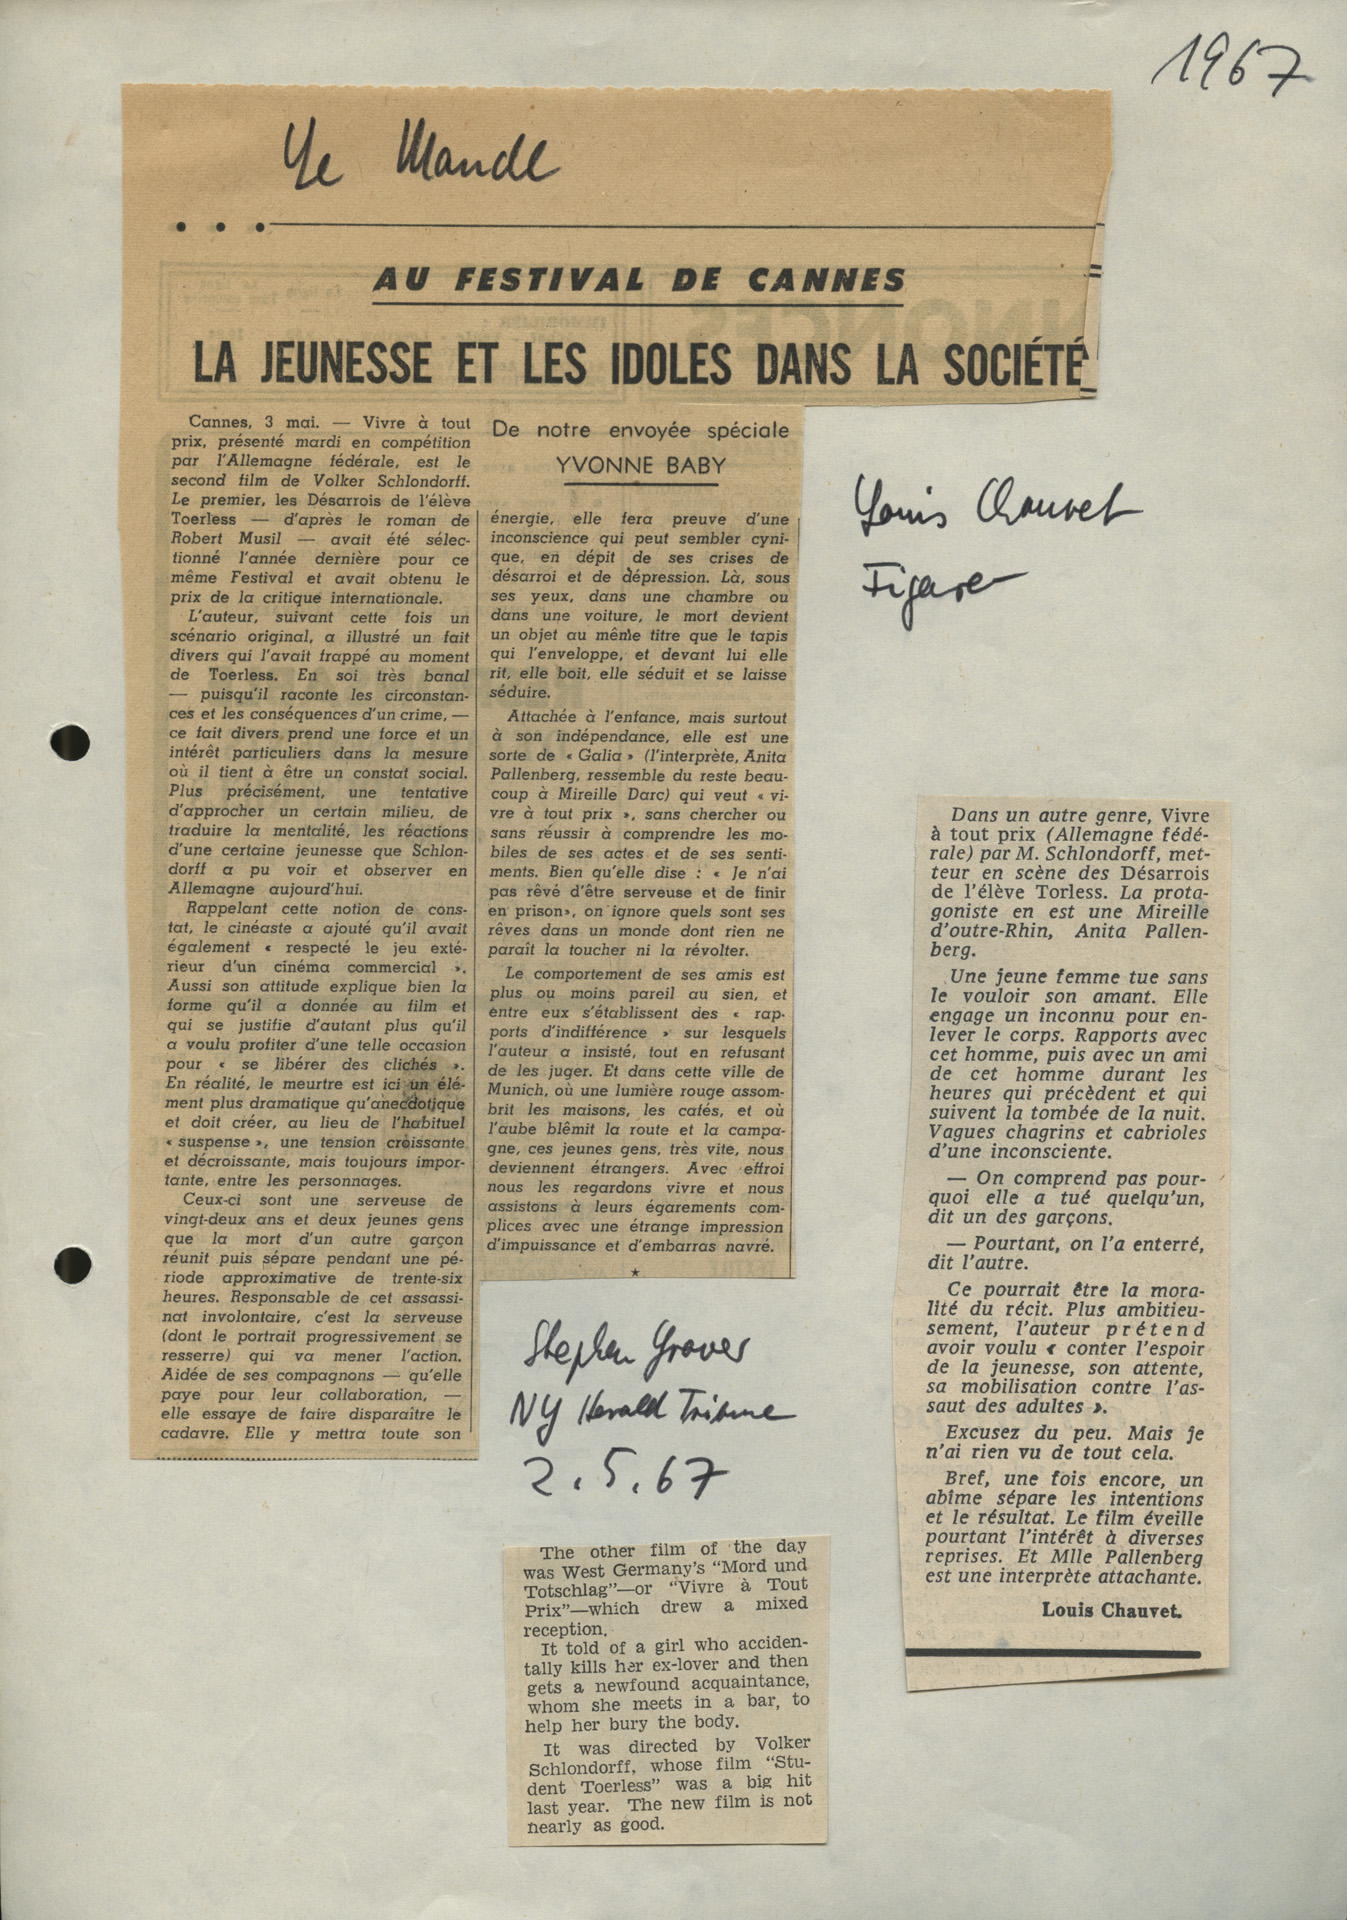 MORD UND TOTSCHLAG // Presse / Le Monde